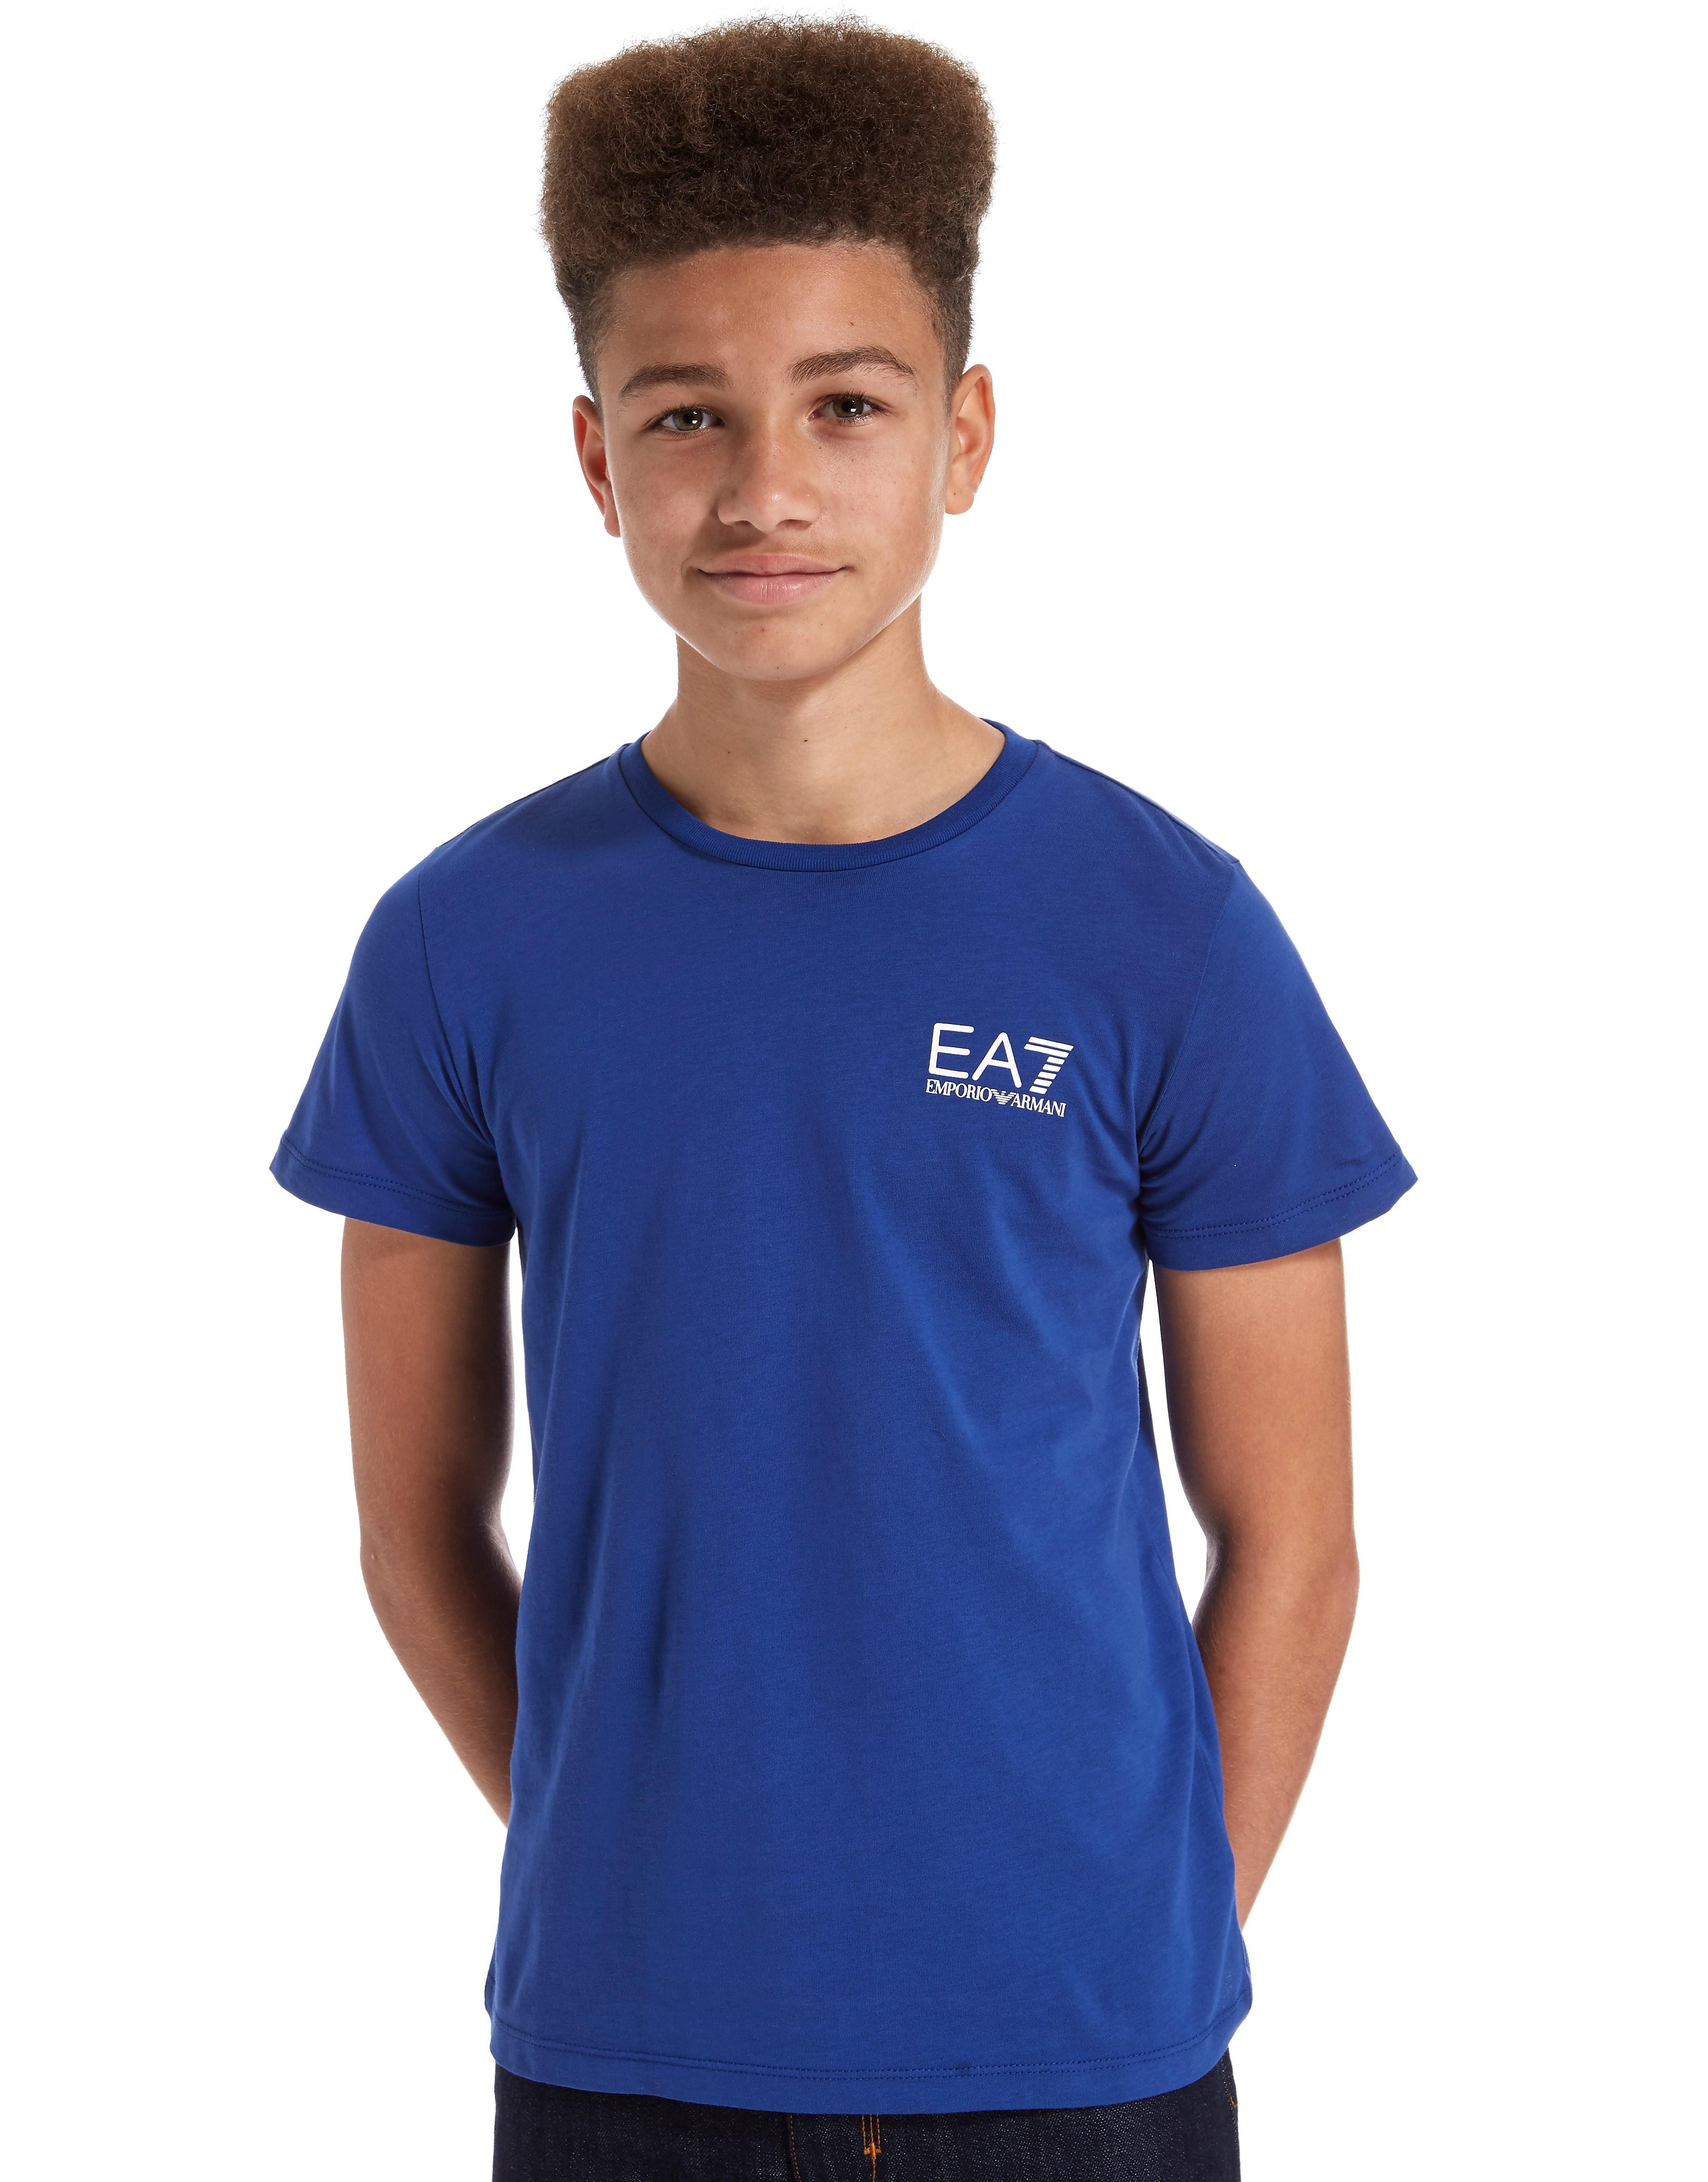 Emporio Armani EA7 Core Klein Logo T-Shirt Junior